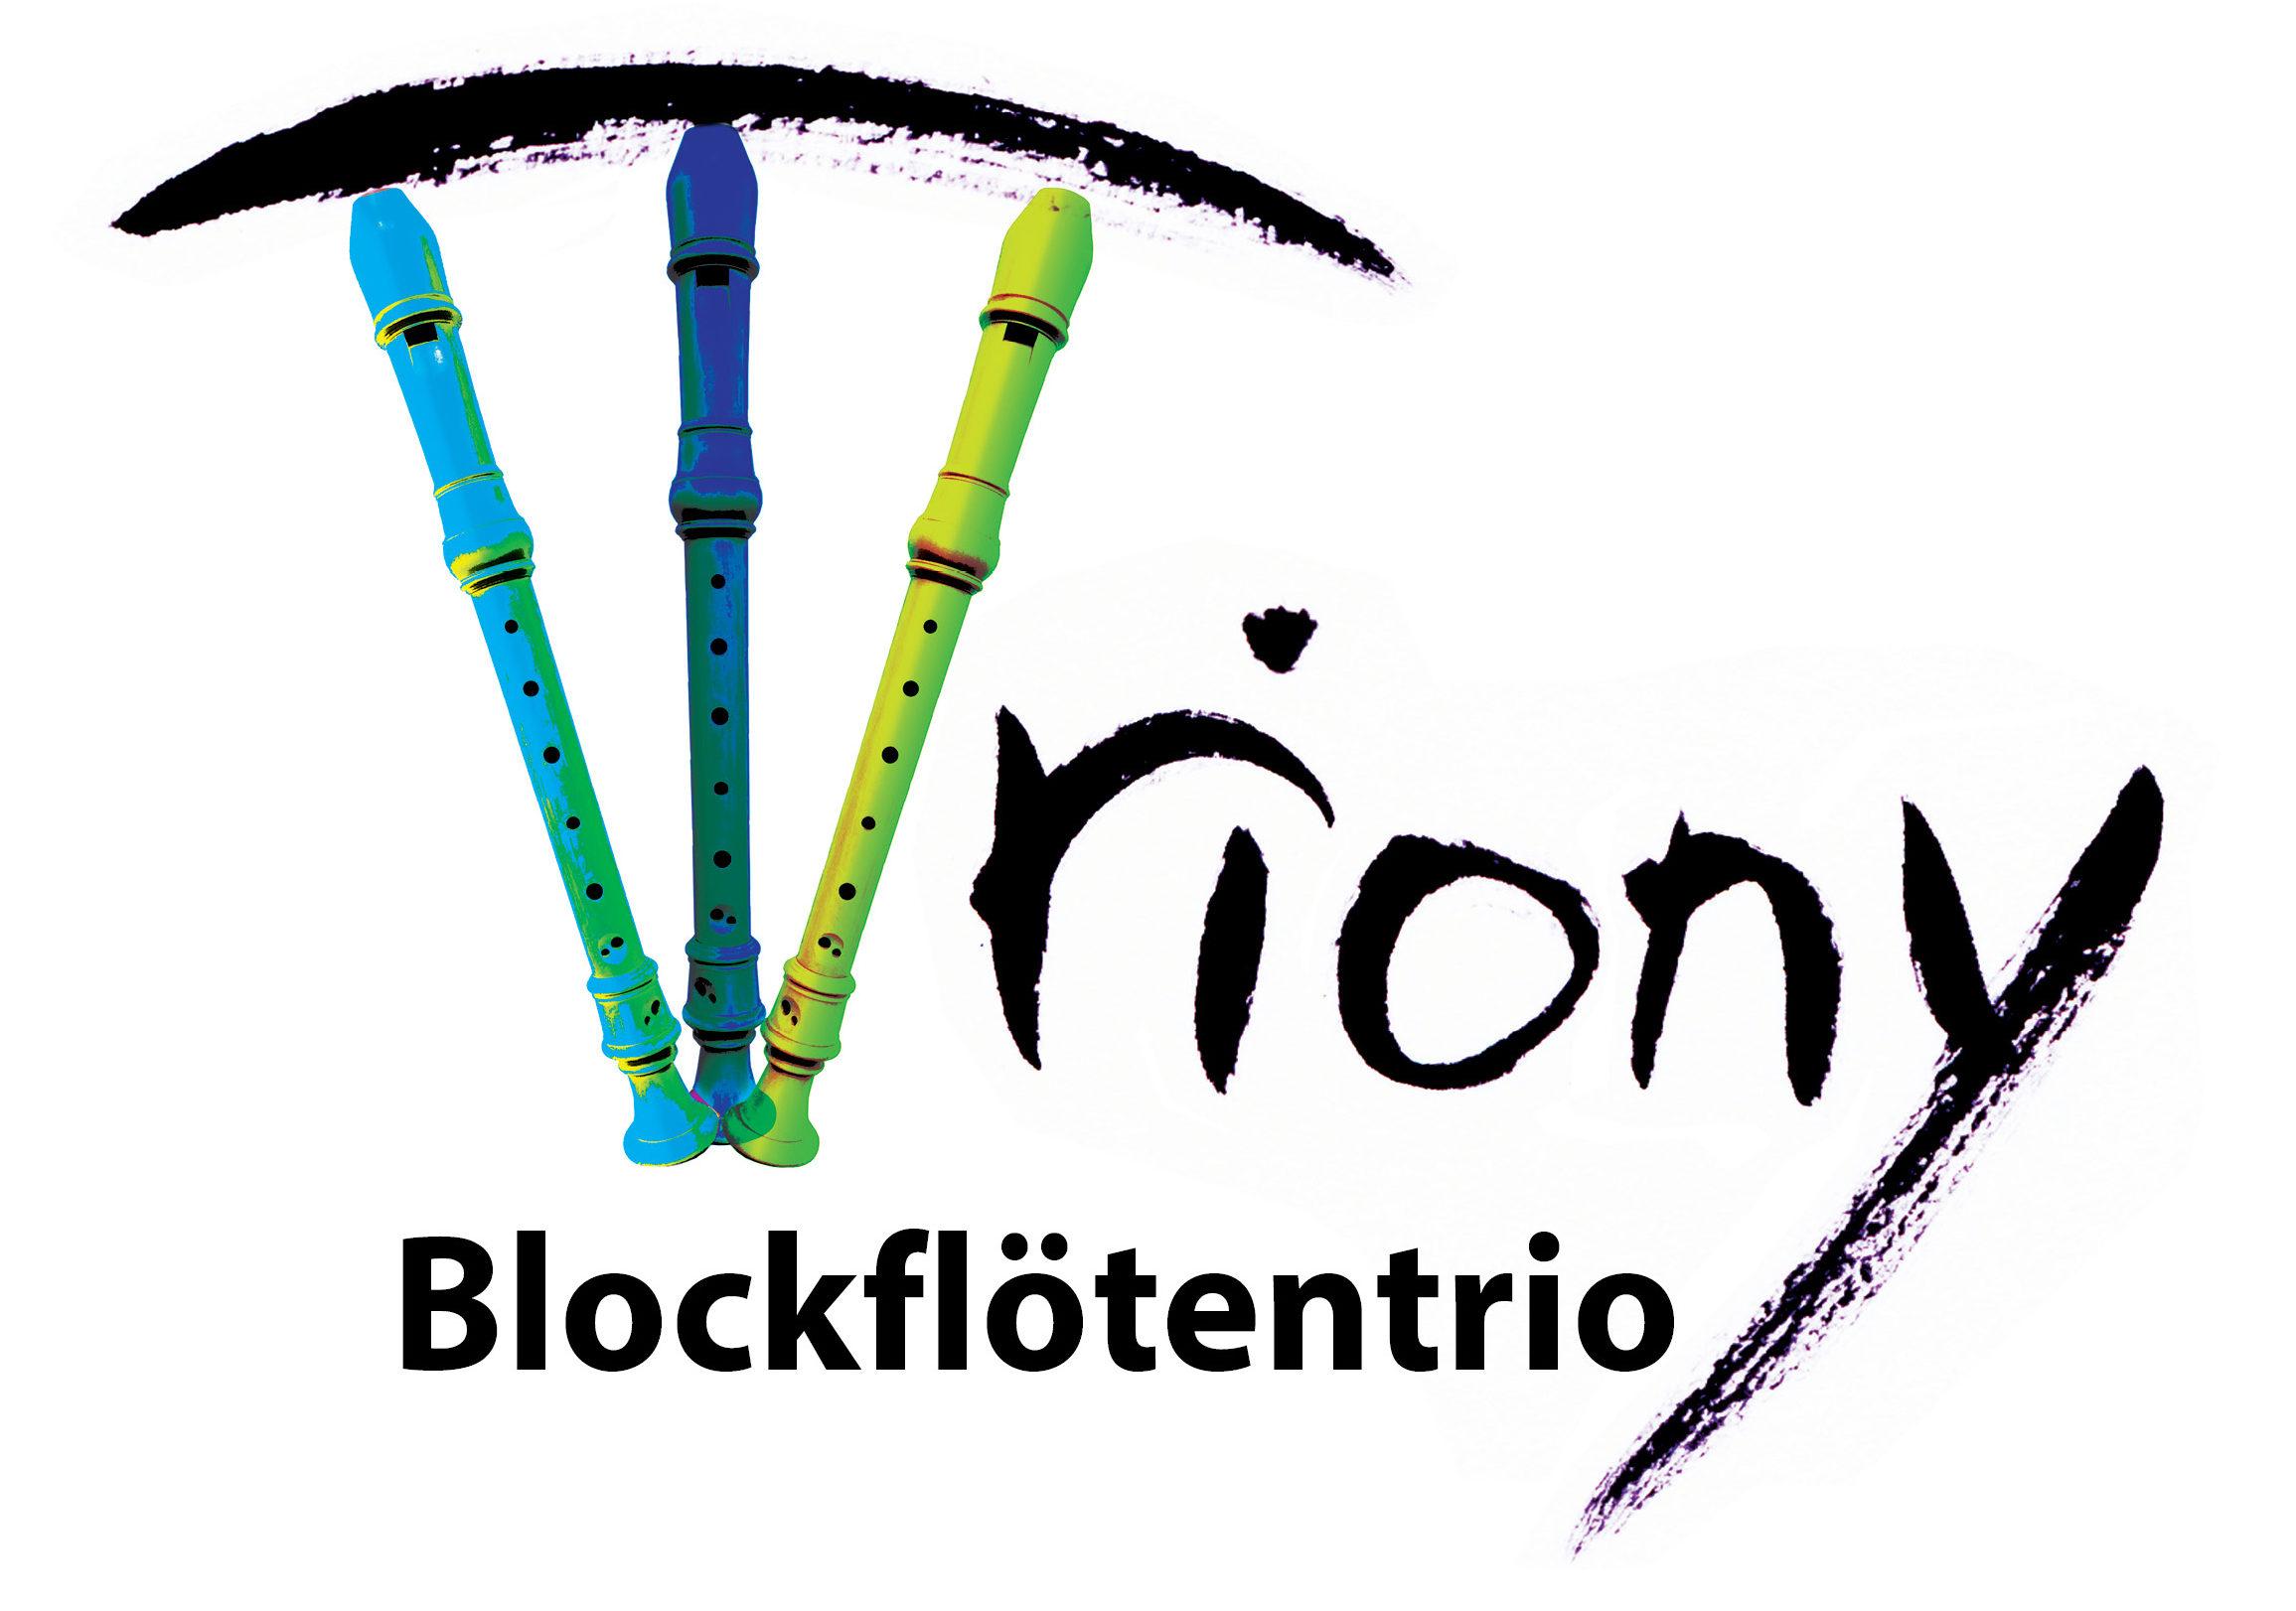 Triony - Blockflöten-Trio